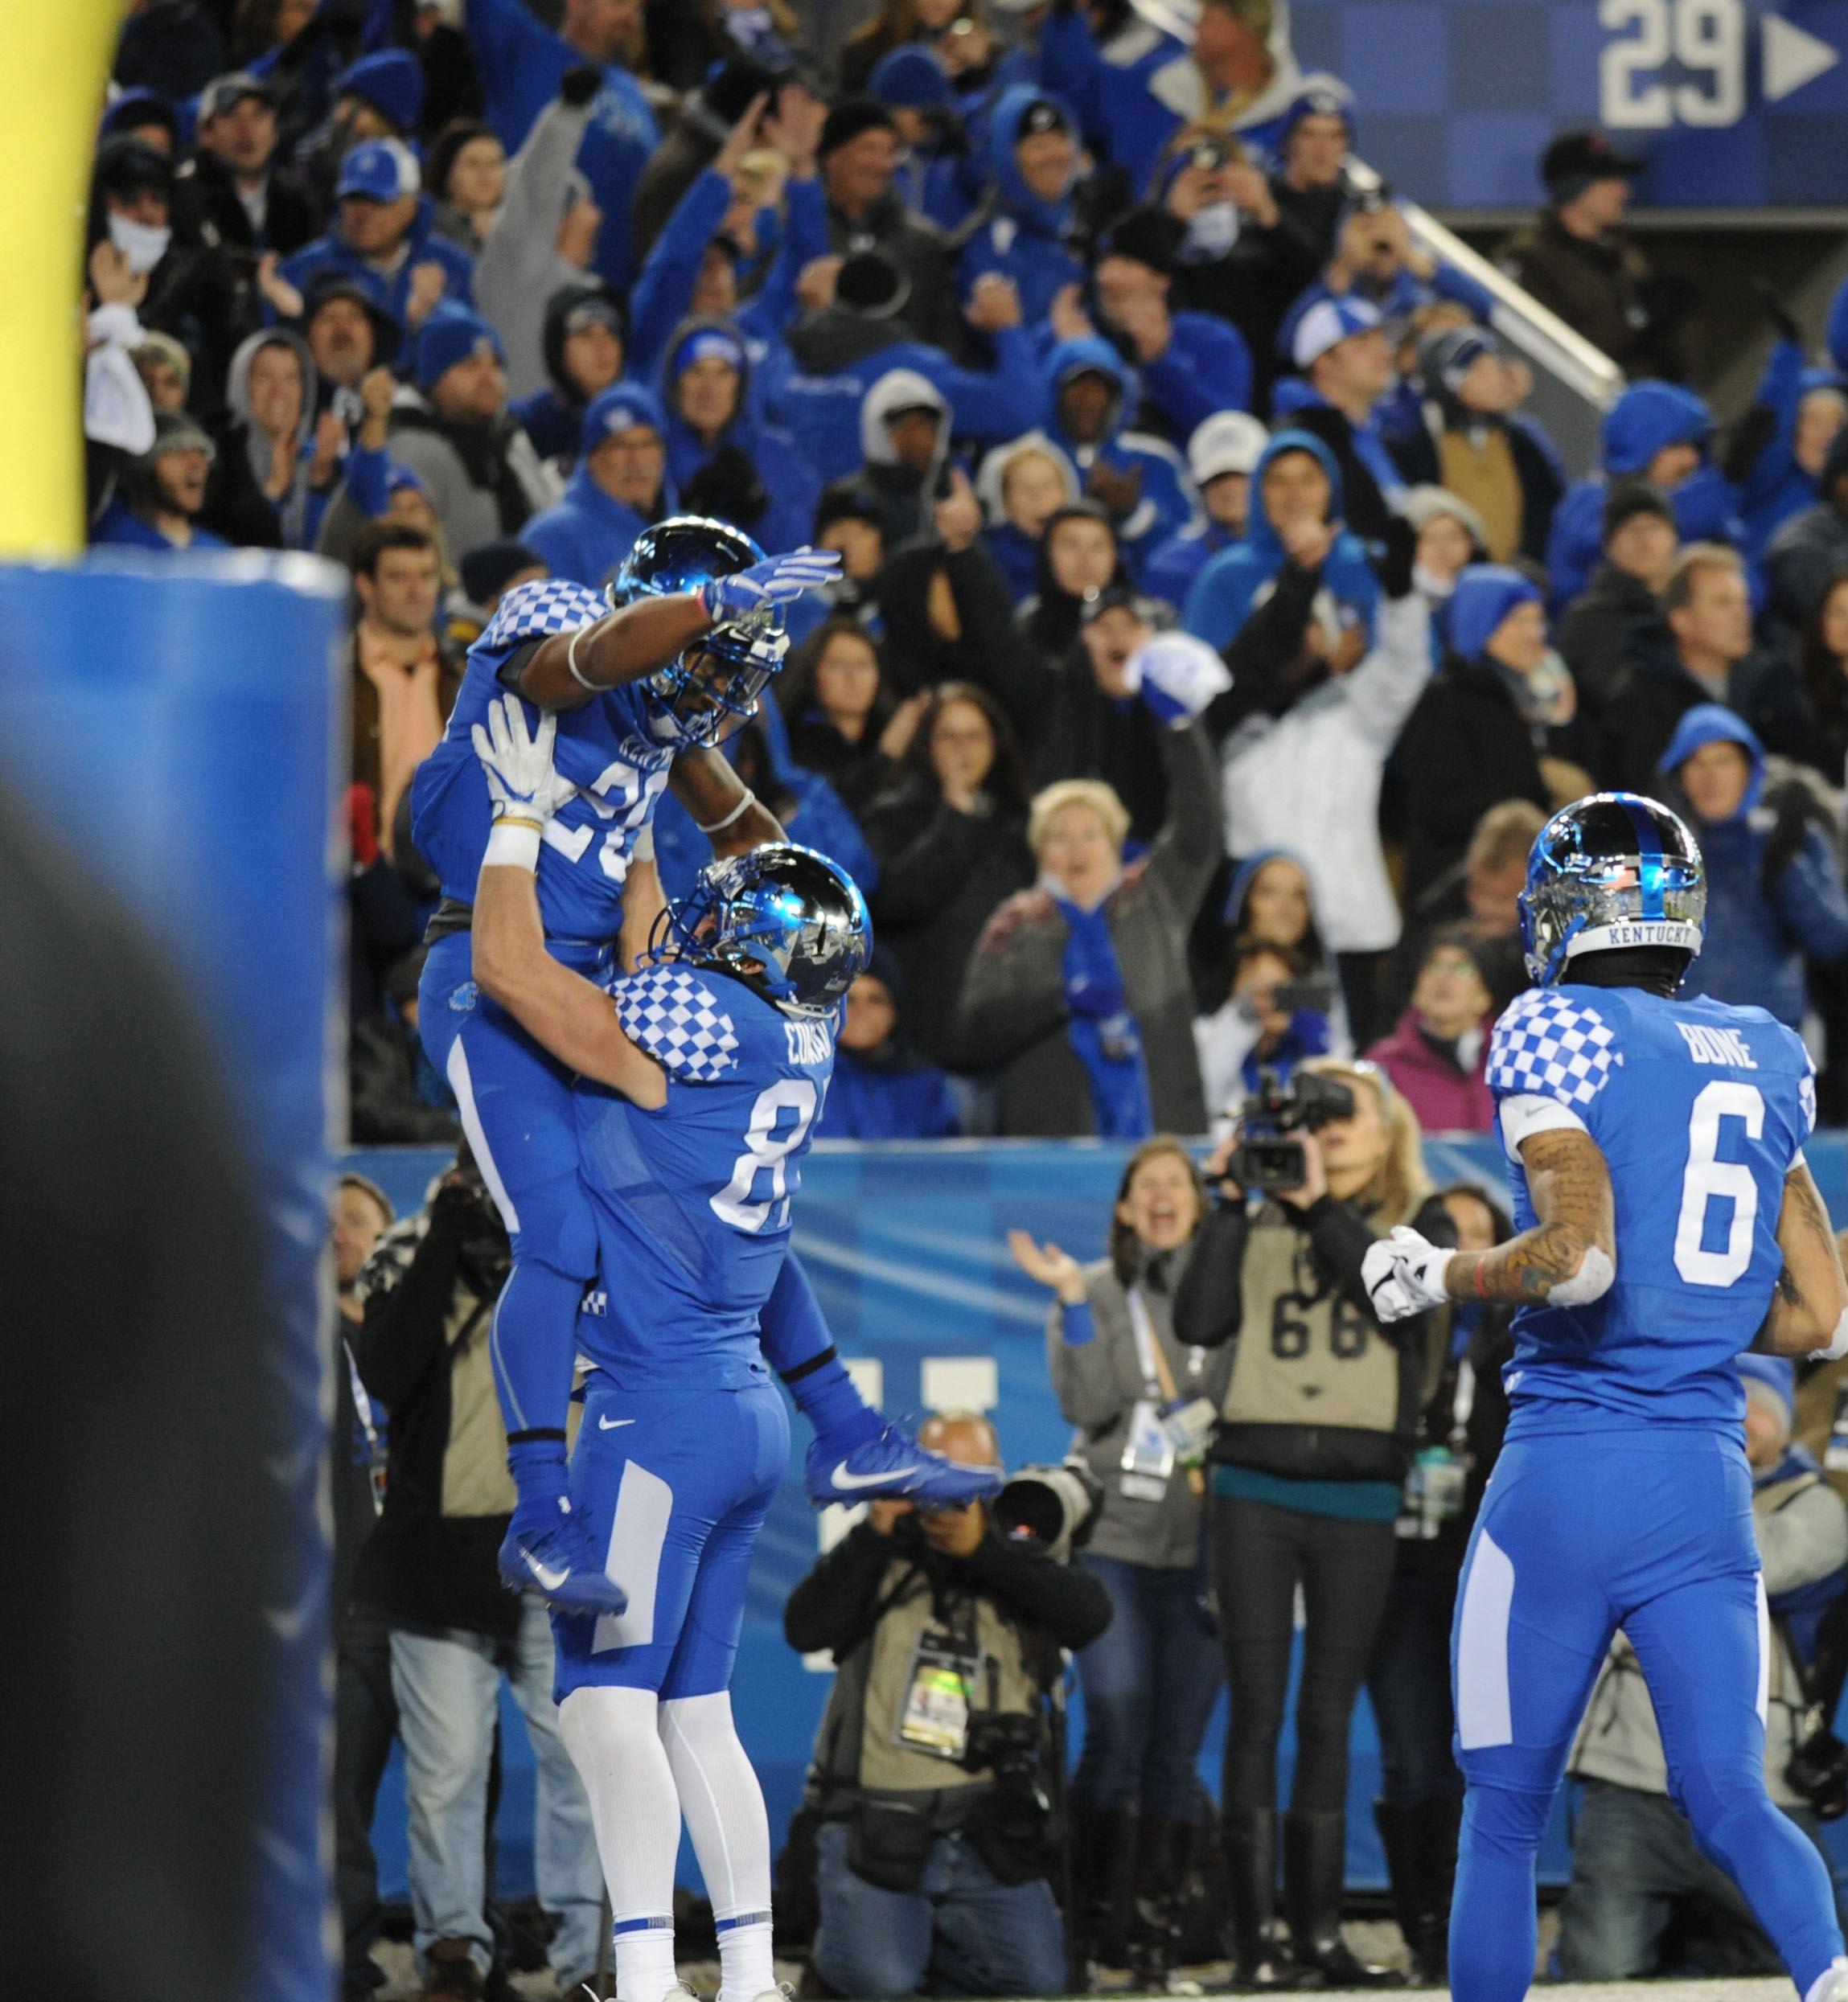 Kentucky vs Tennessee Photo Gallery Vaughts Views